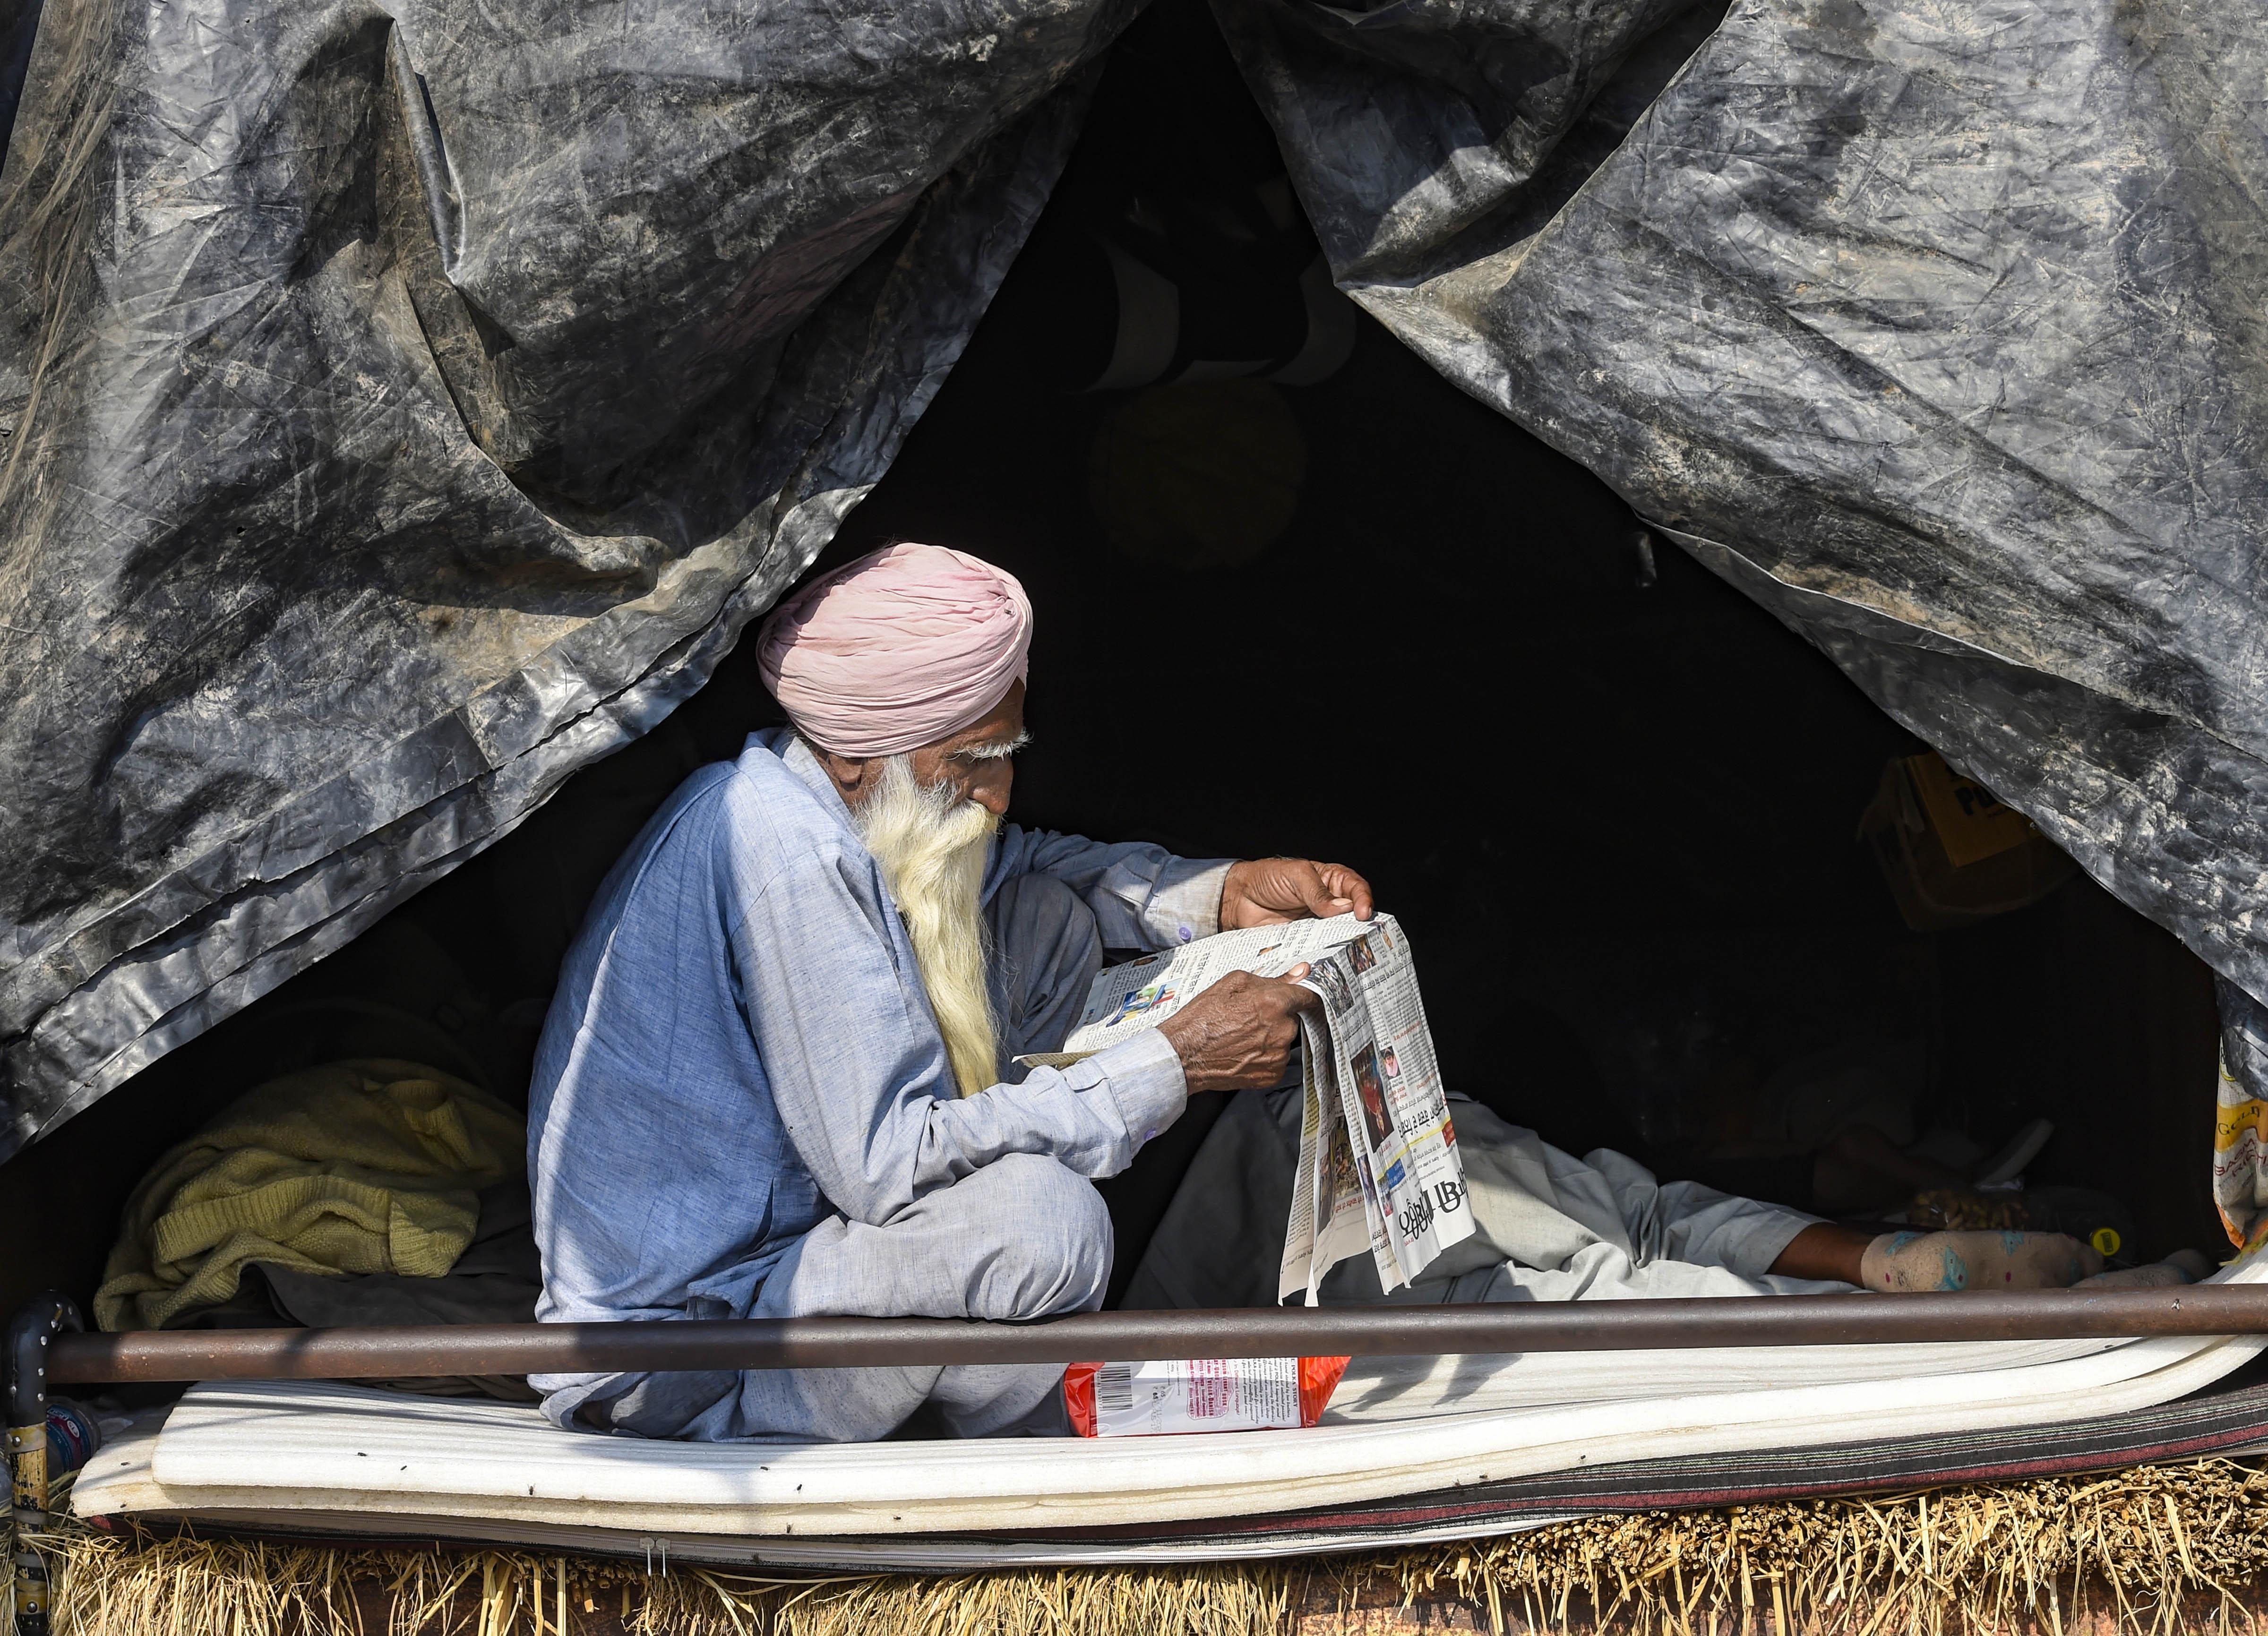 "<p style=""text-align: right;"">دہلی، سنگھو بارڈر&nbsp; پر ایک کسان اخبار کا مطالعہ کرتے ہوئے۔ کسانوں نے گودی میڈیا کا بائیکاٹ کیا ہے۔ بی جے پی کے آئی ٹی سیل کے مقابلے میں کسانوں نے بھی اپنا آئی ٹی سیل بنا لیا ہے۔علاوہ ازیں کسانوں نے خود کا ایک اخبار بھی جاری کر دیا ہے۔ تصویر : پی ٹی آئی</p>"">4/6</p>    <p class="